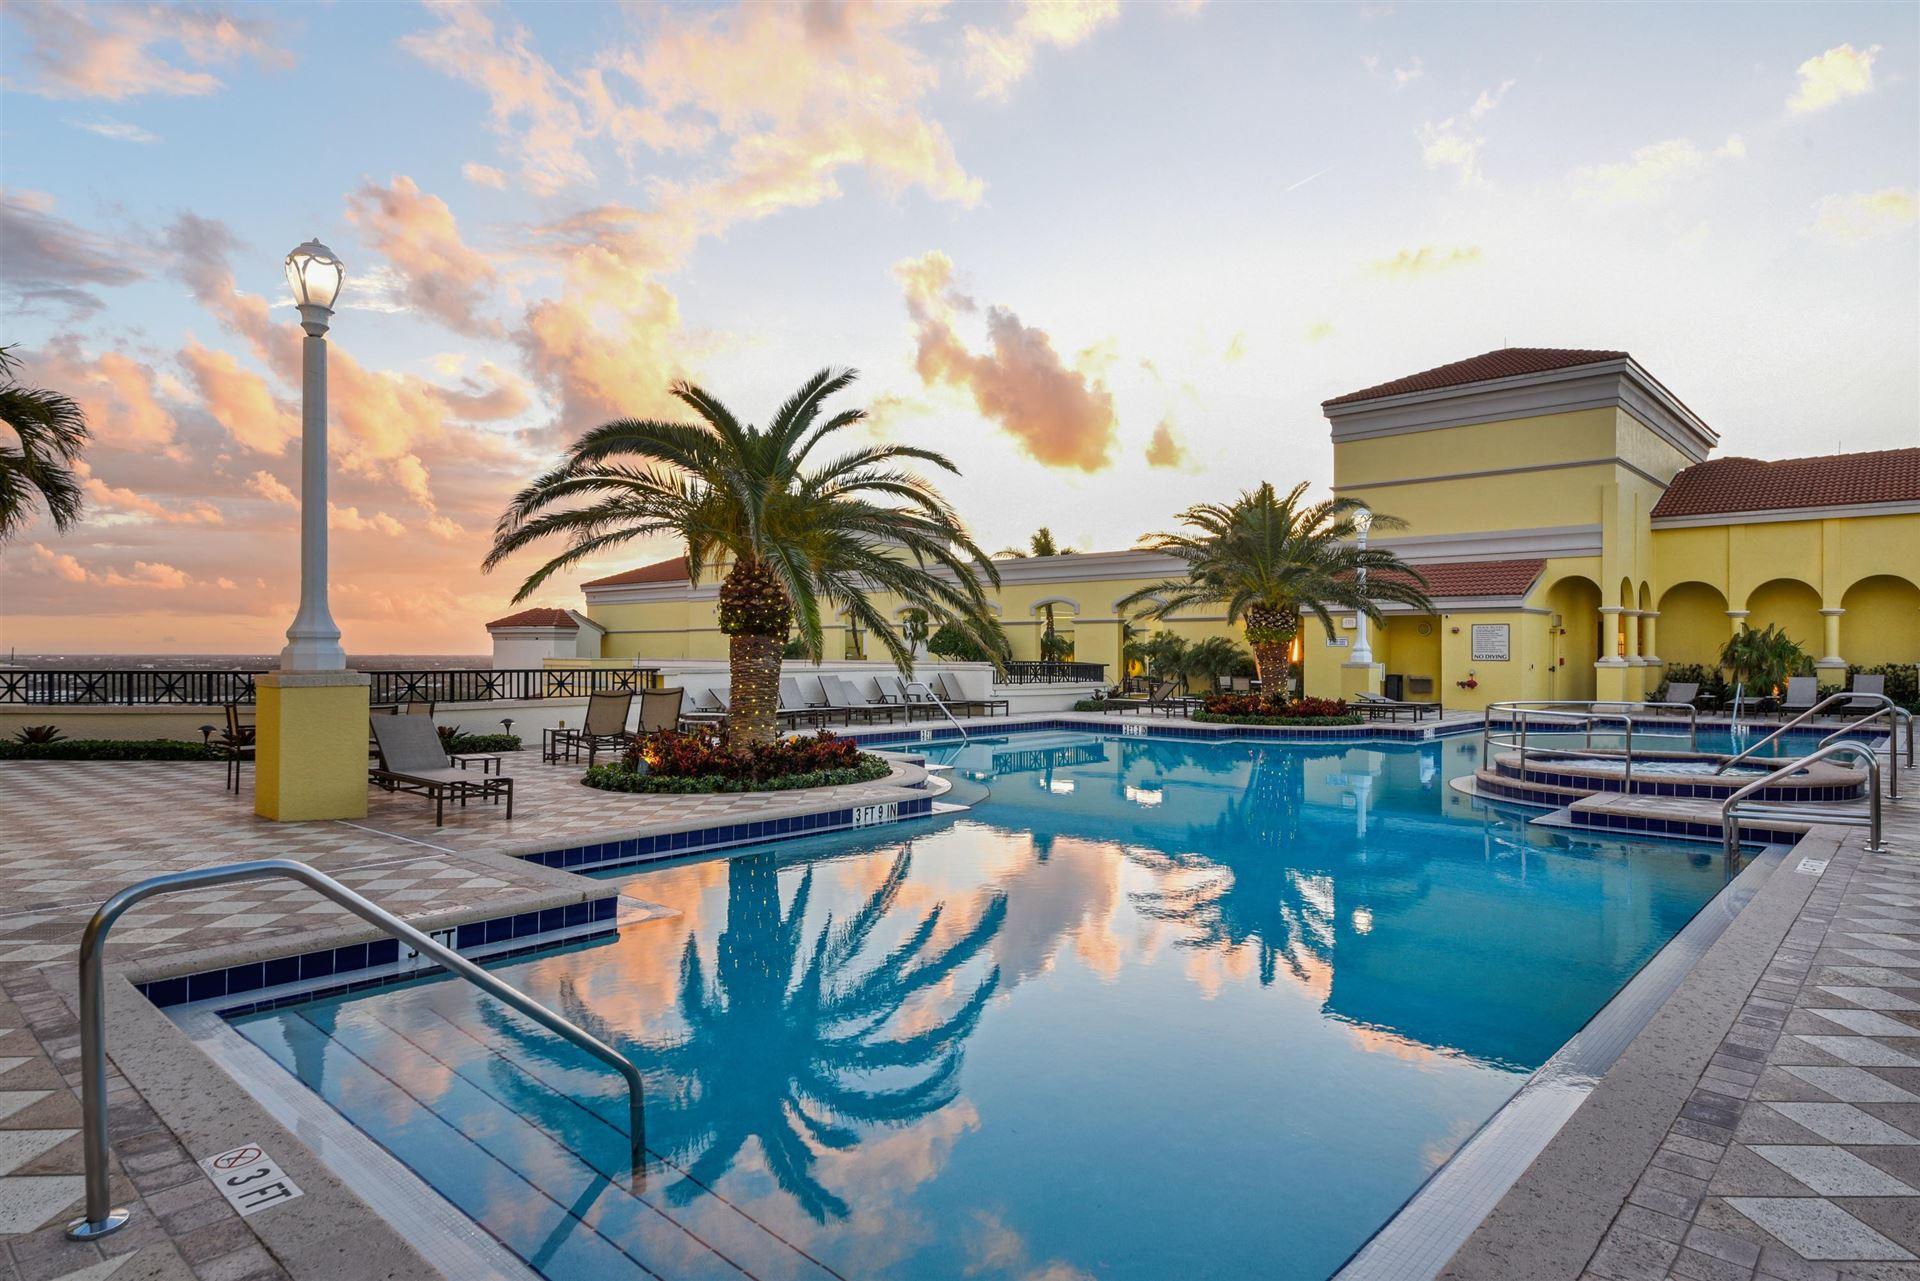 701 S Olive Avenue #624, West Palm Beach, FL 33401 - MLS#: RX-10735925